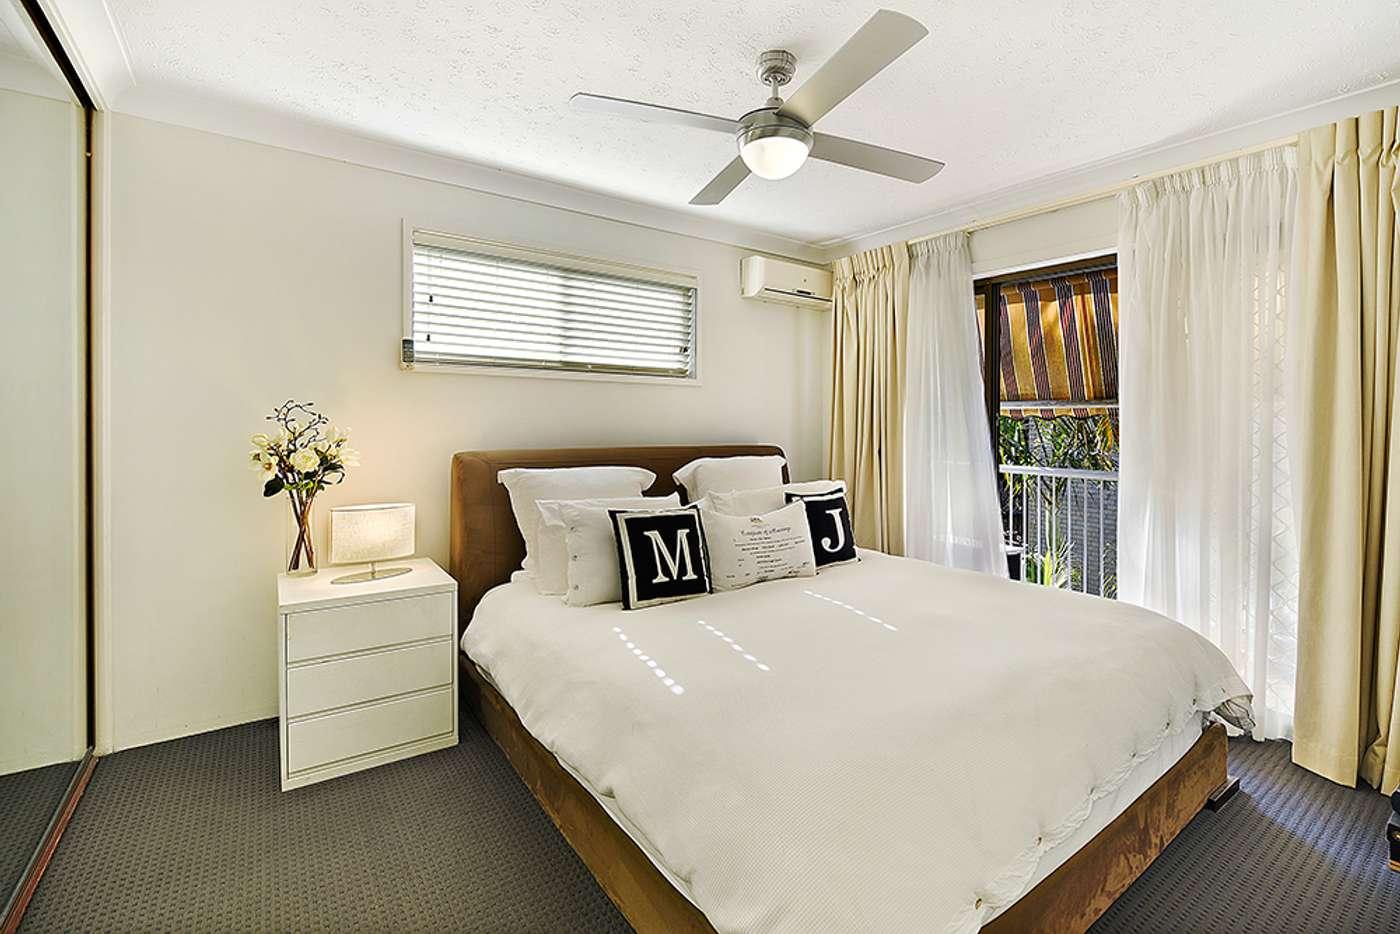 Sixth view of Homely unit listing, 4/11 Armrick Avenue, Broadbeach QLD 4218